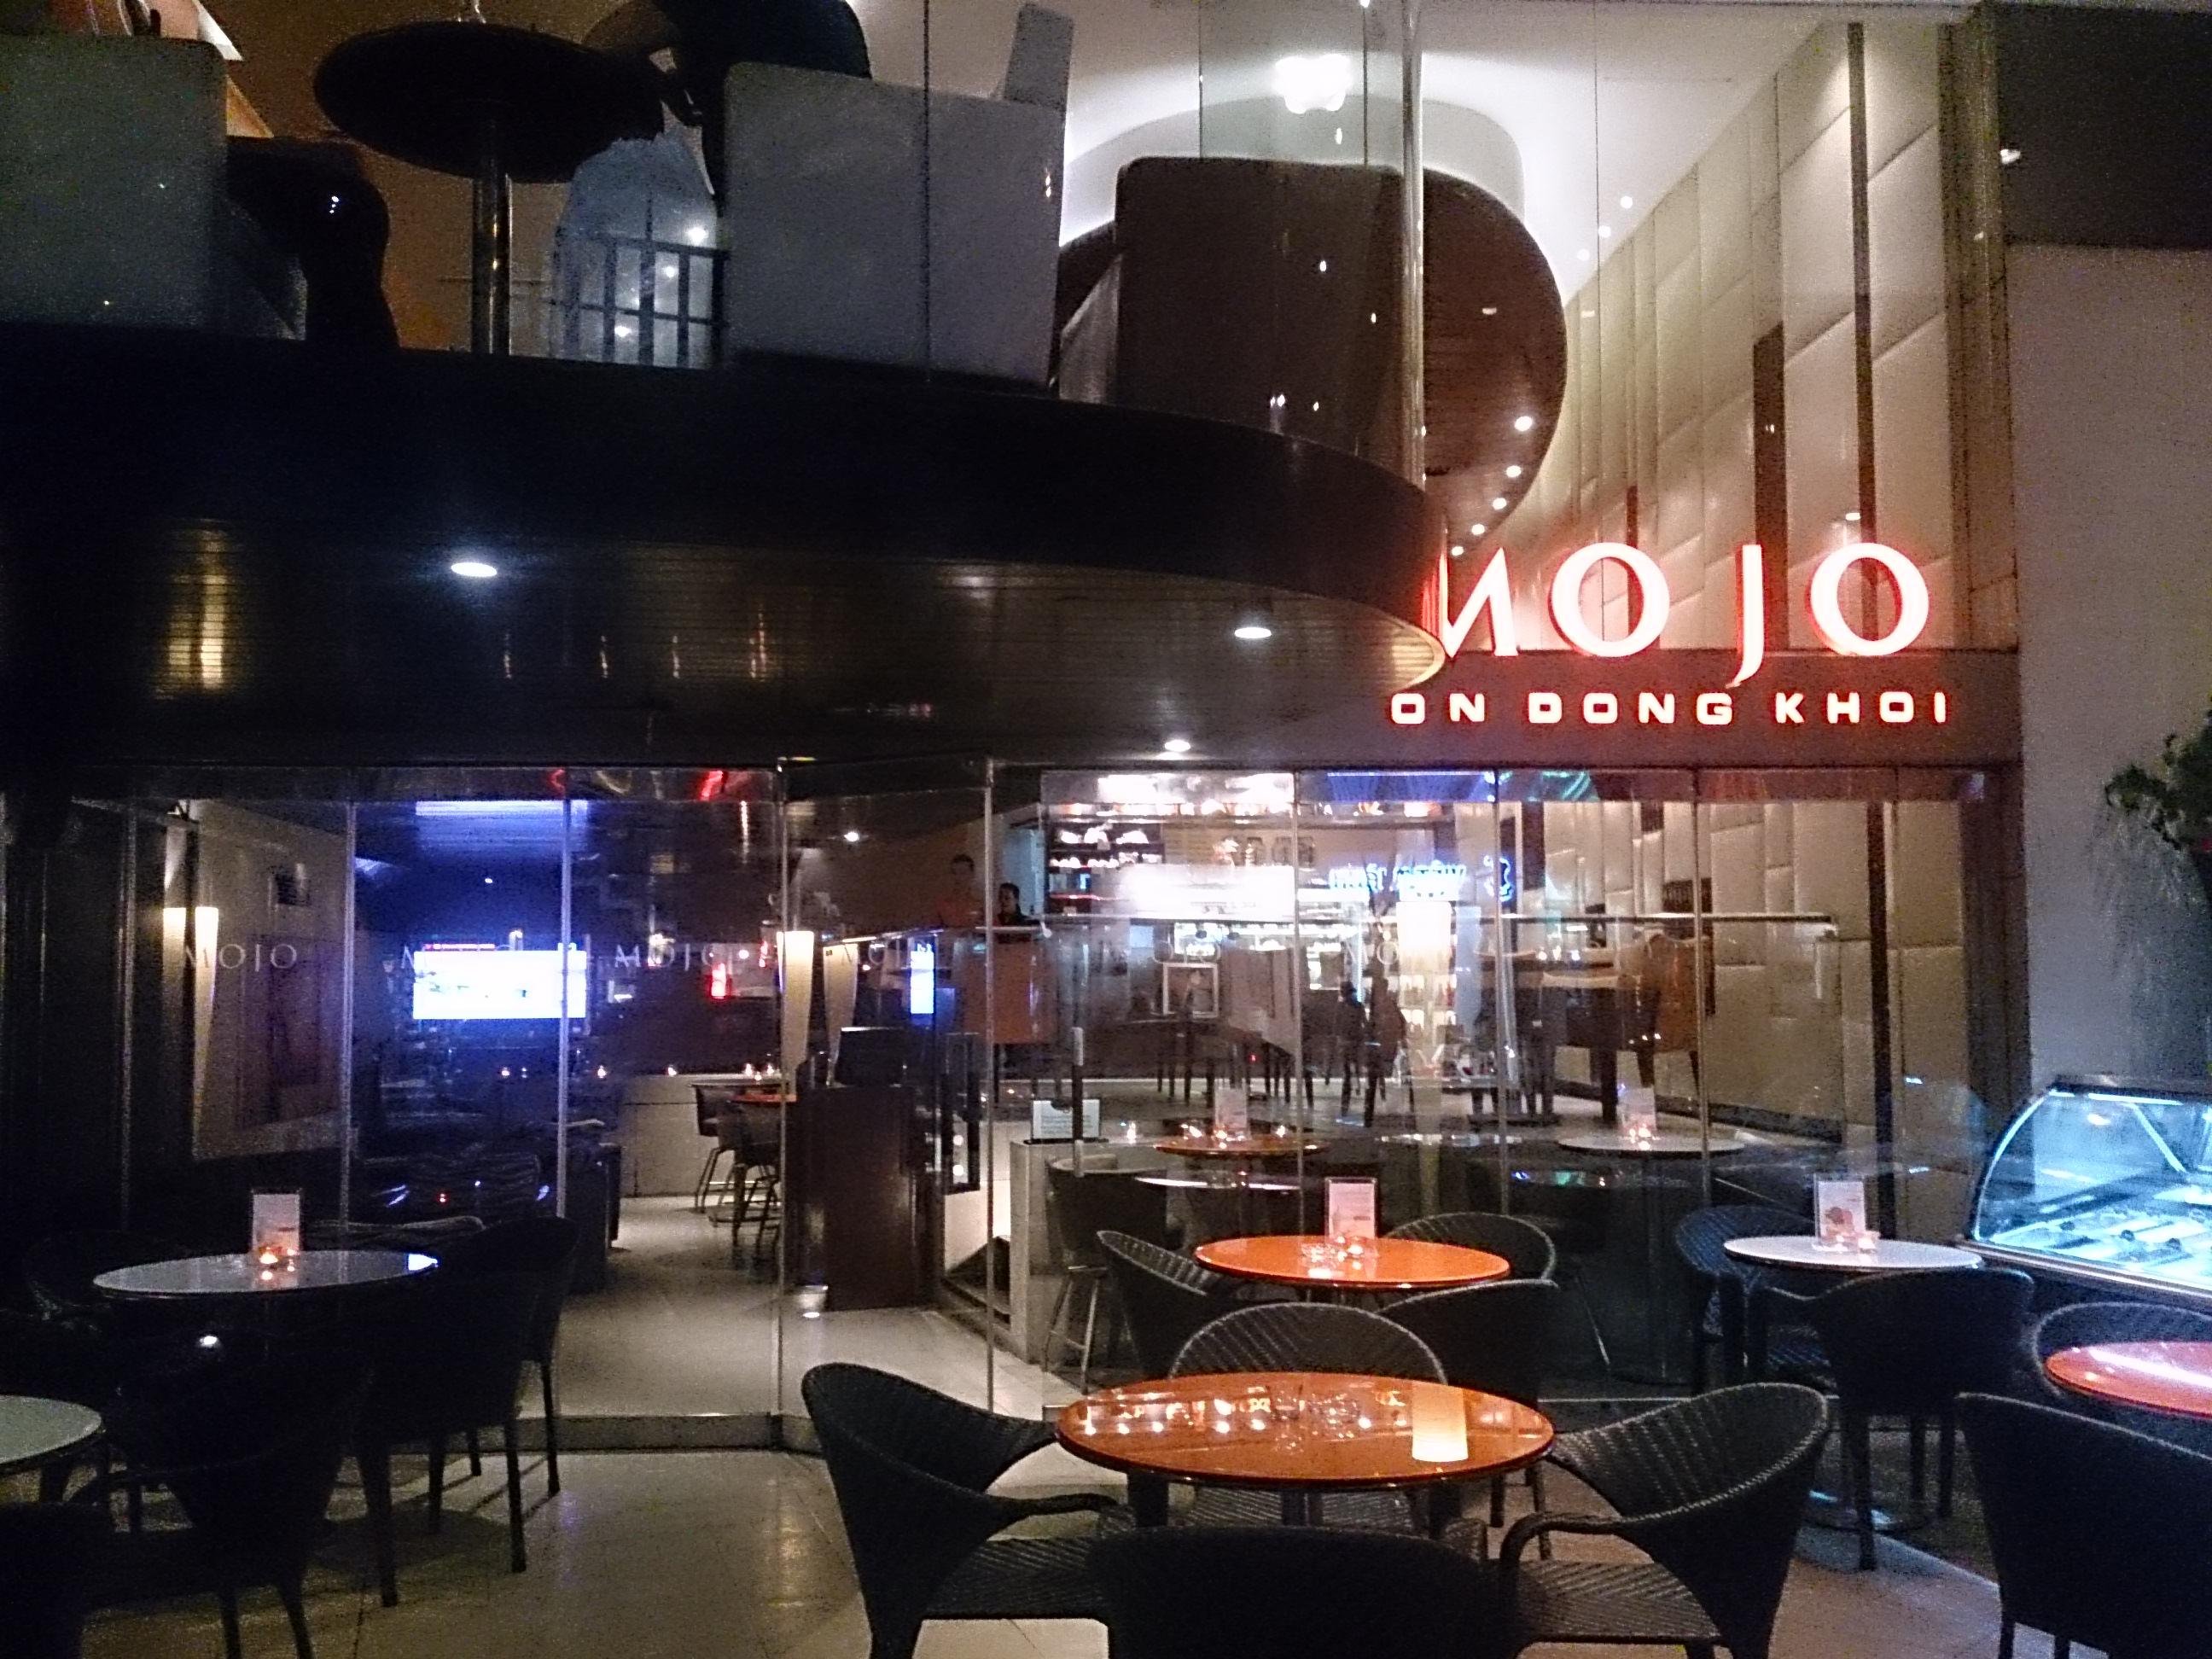 MOJO ドンコイ通りに面したお洒落カフェ/バー